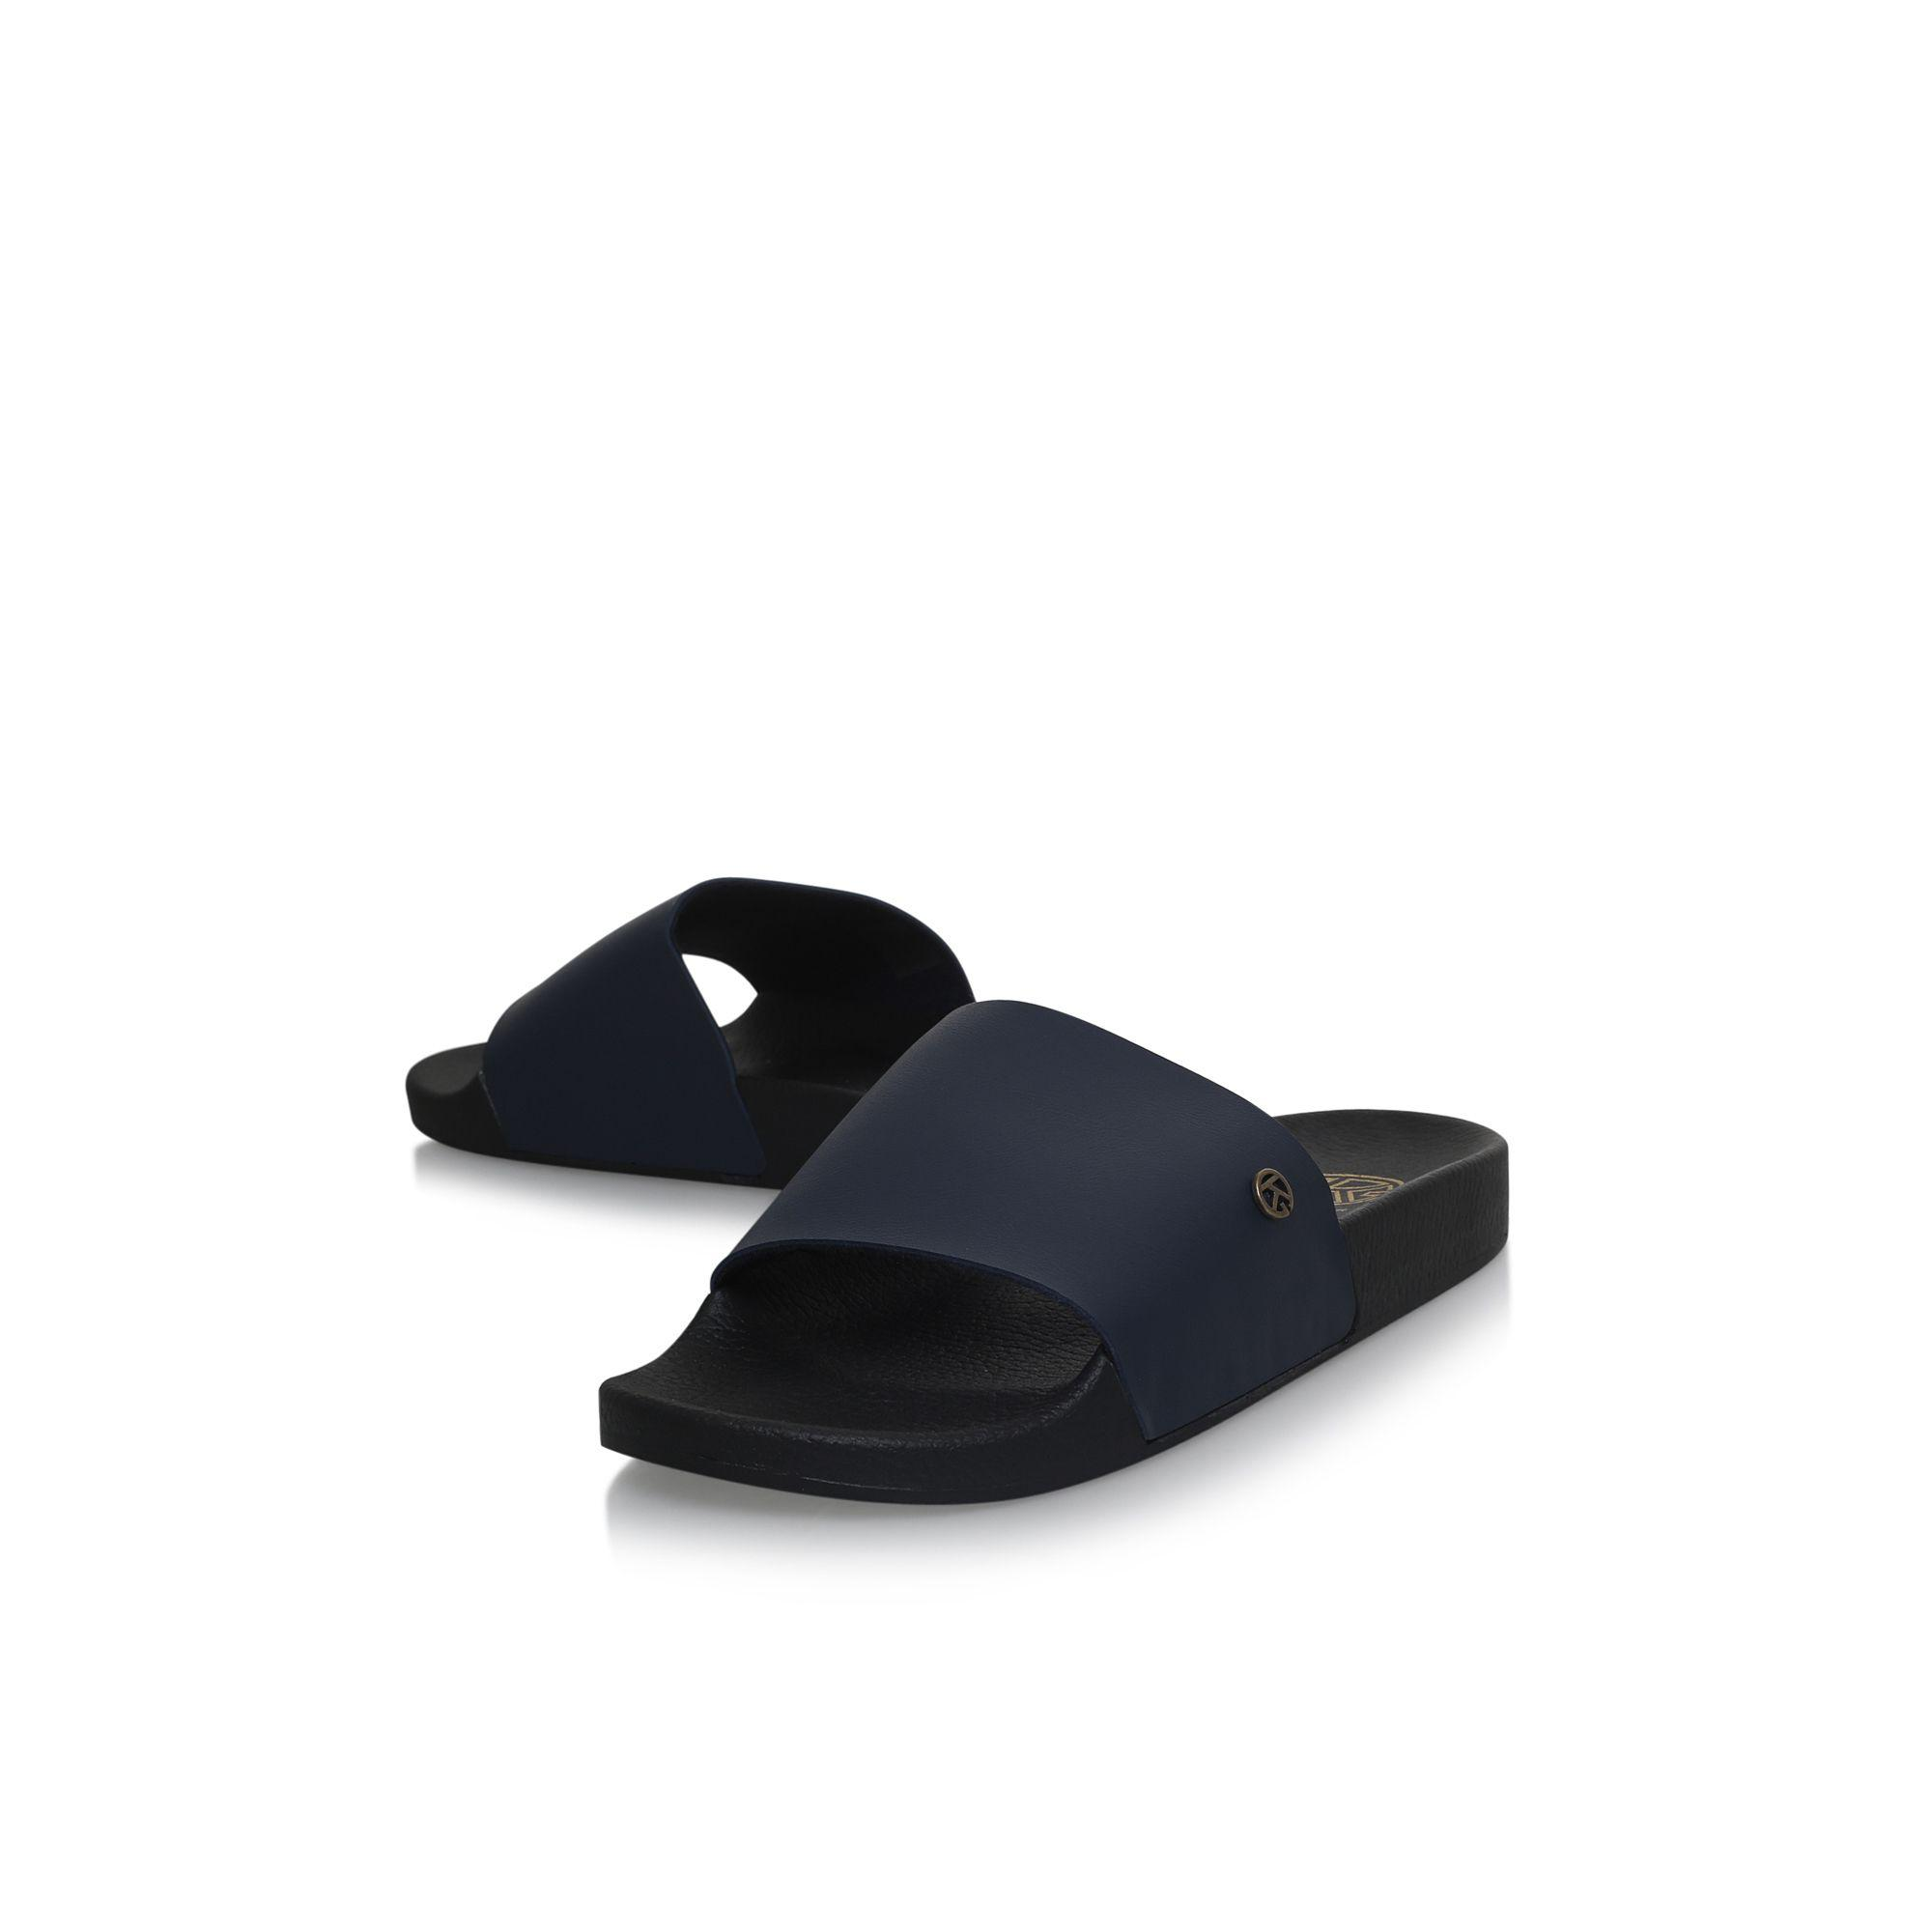 ad2edb309718 KG by Kurt Geiger - Blue Lydd Flat Slip On Sandals for Men - Lyst. View  fullscreen